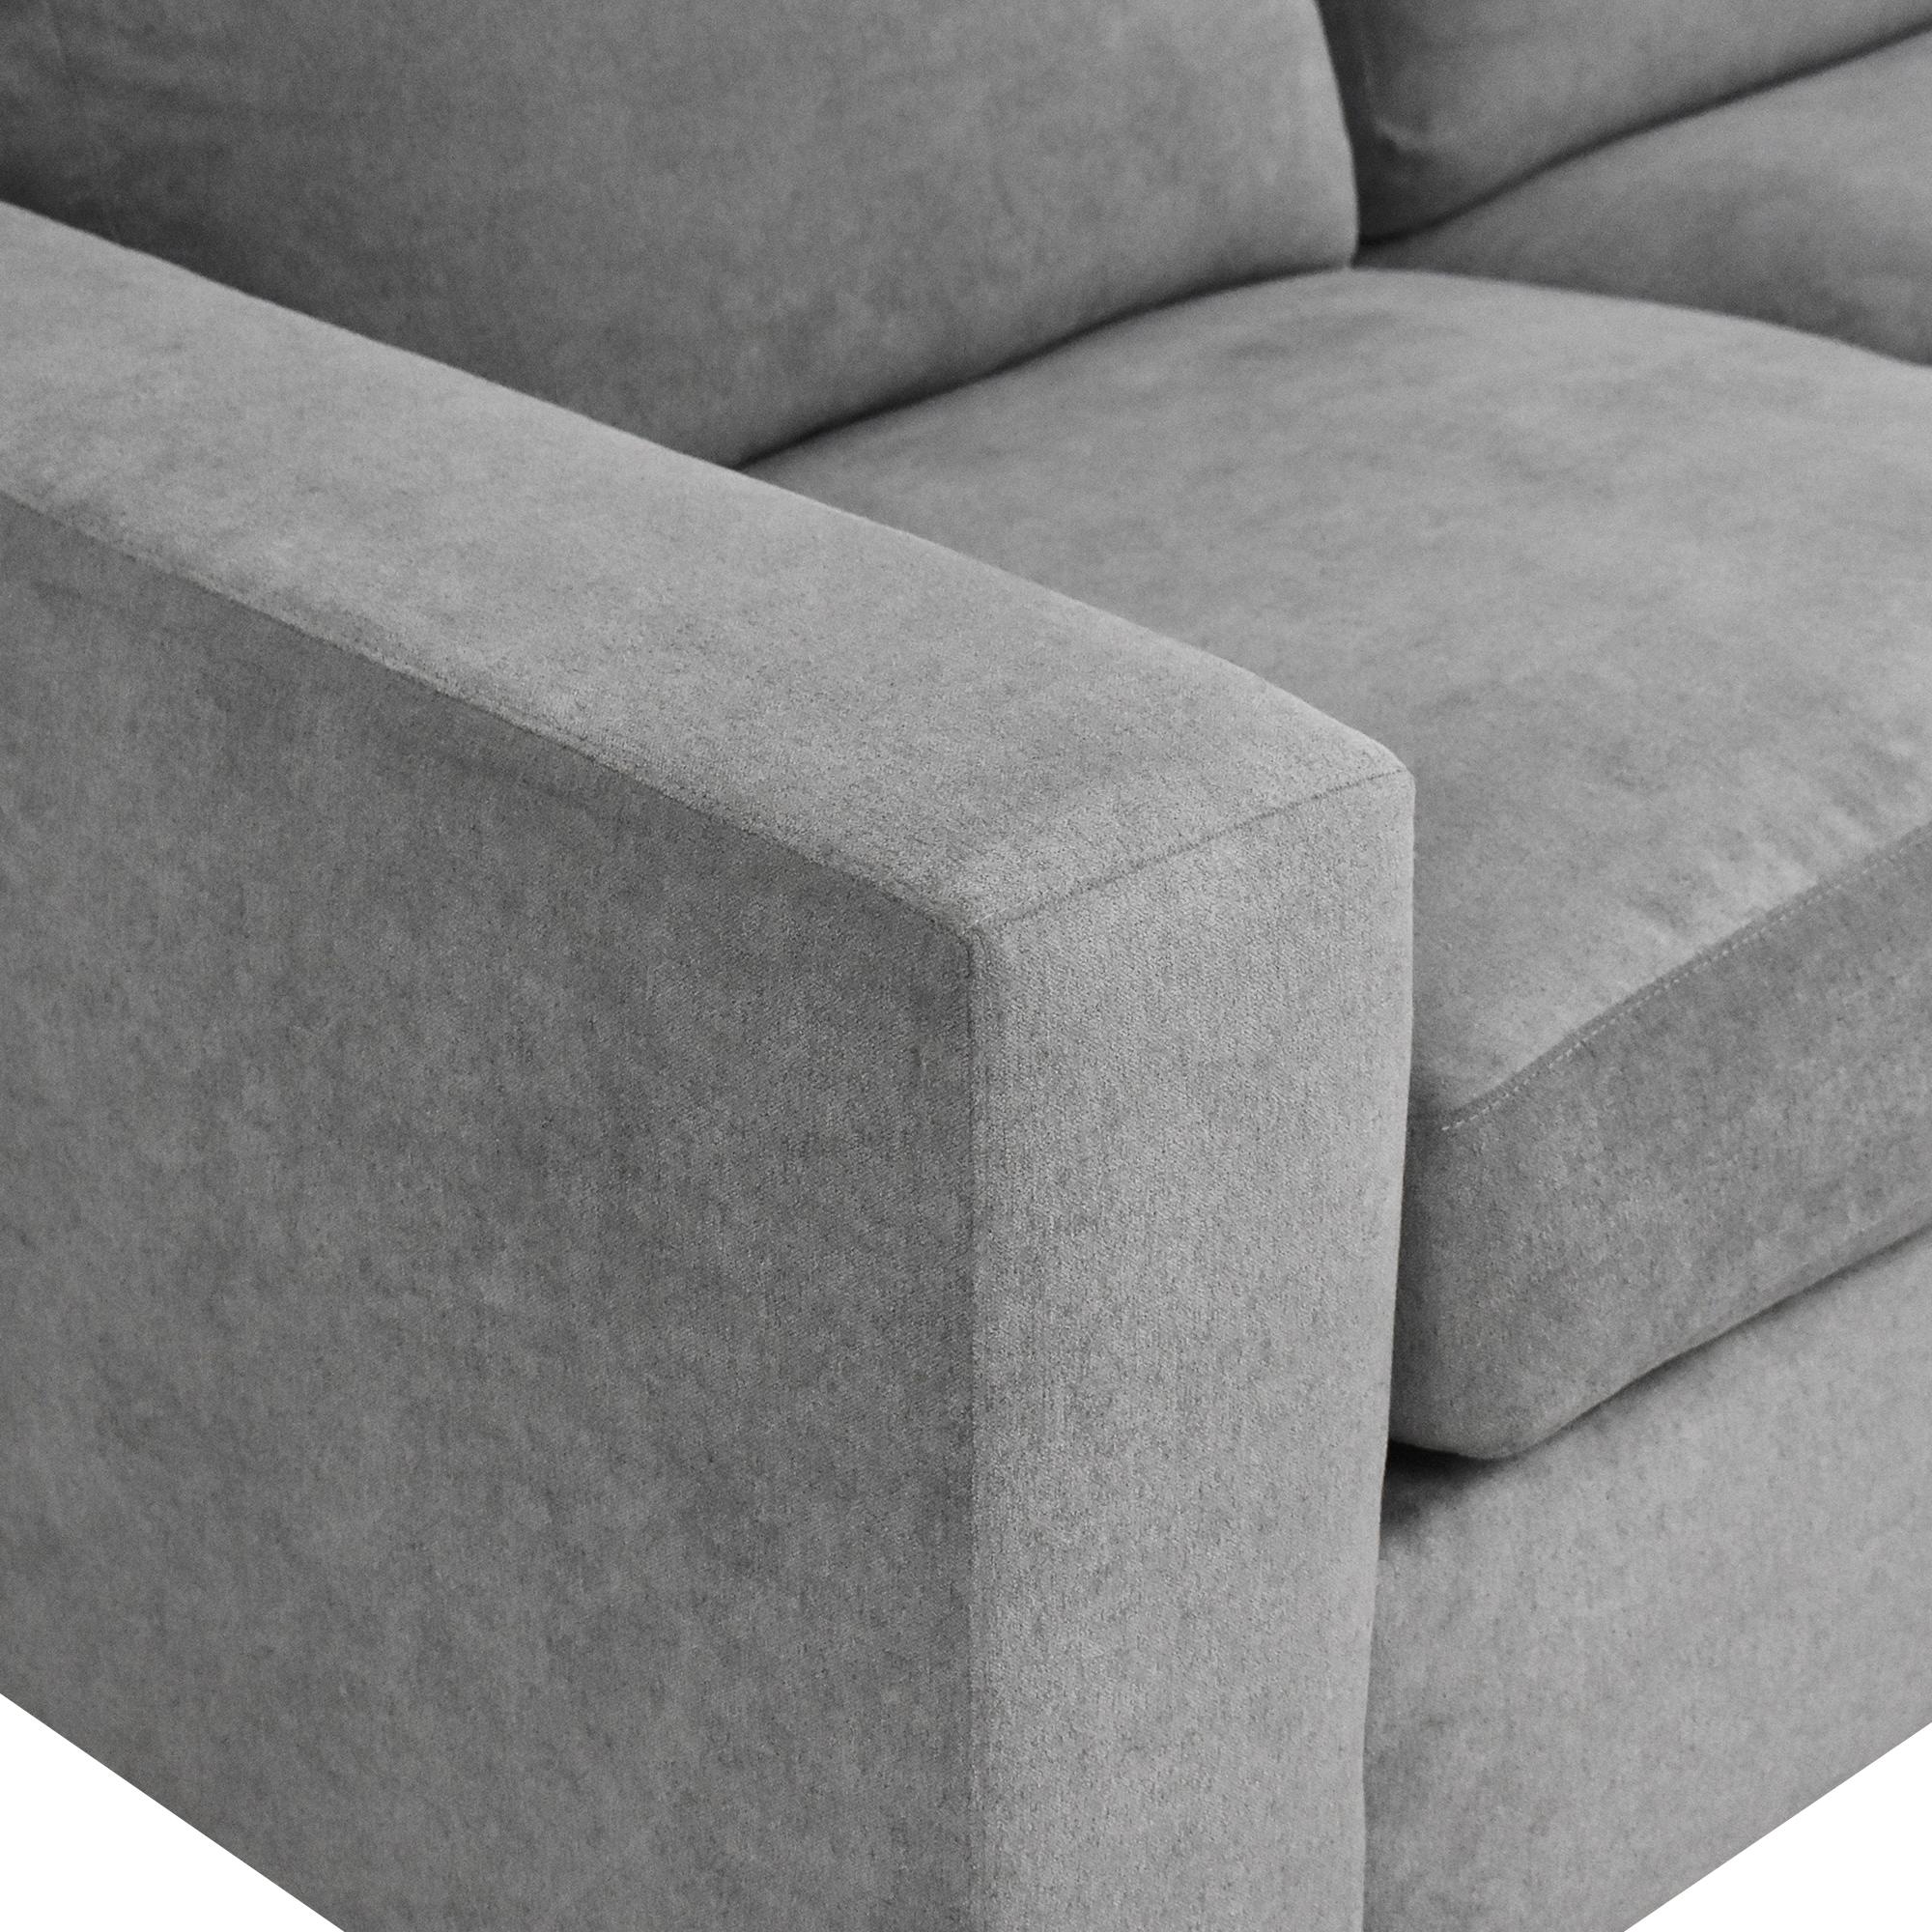 buy BenchMade Modern Couch Potato Sofa BenchMade Modern Classic Sofas